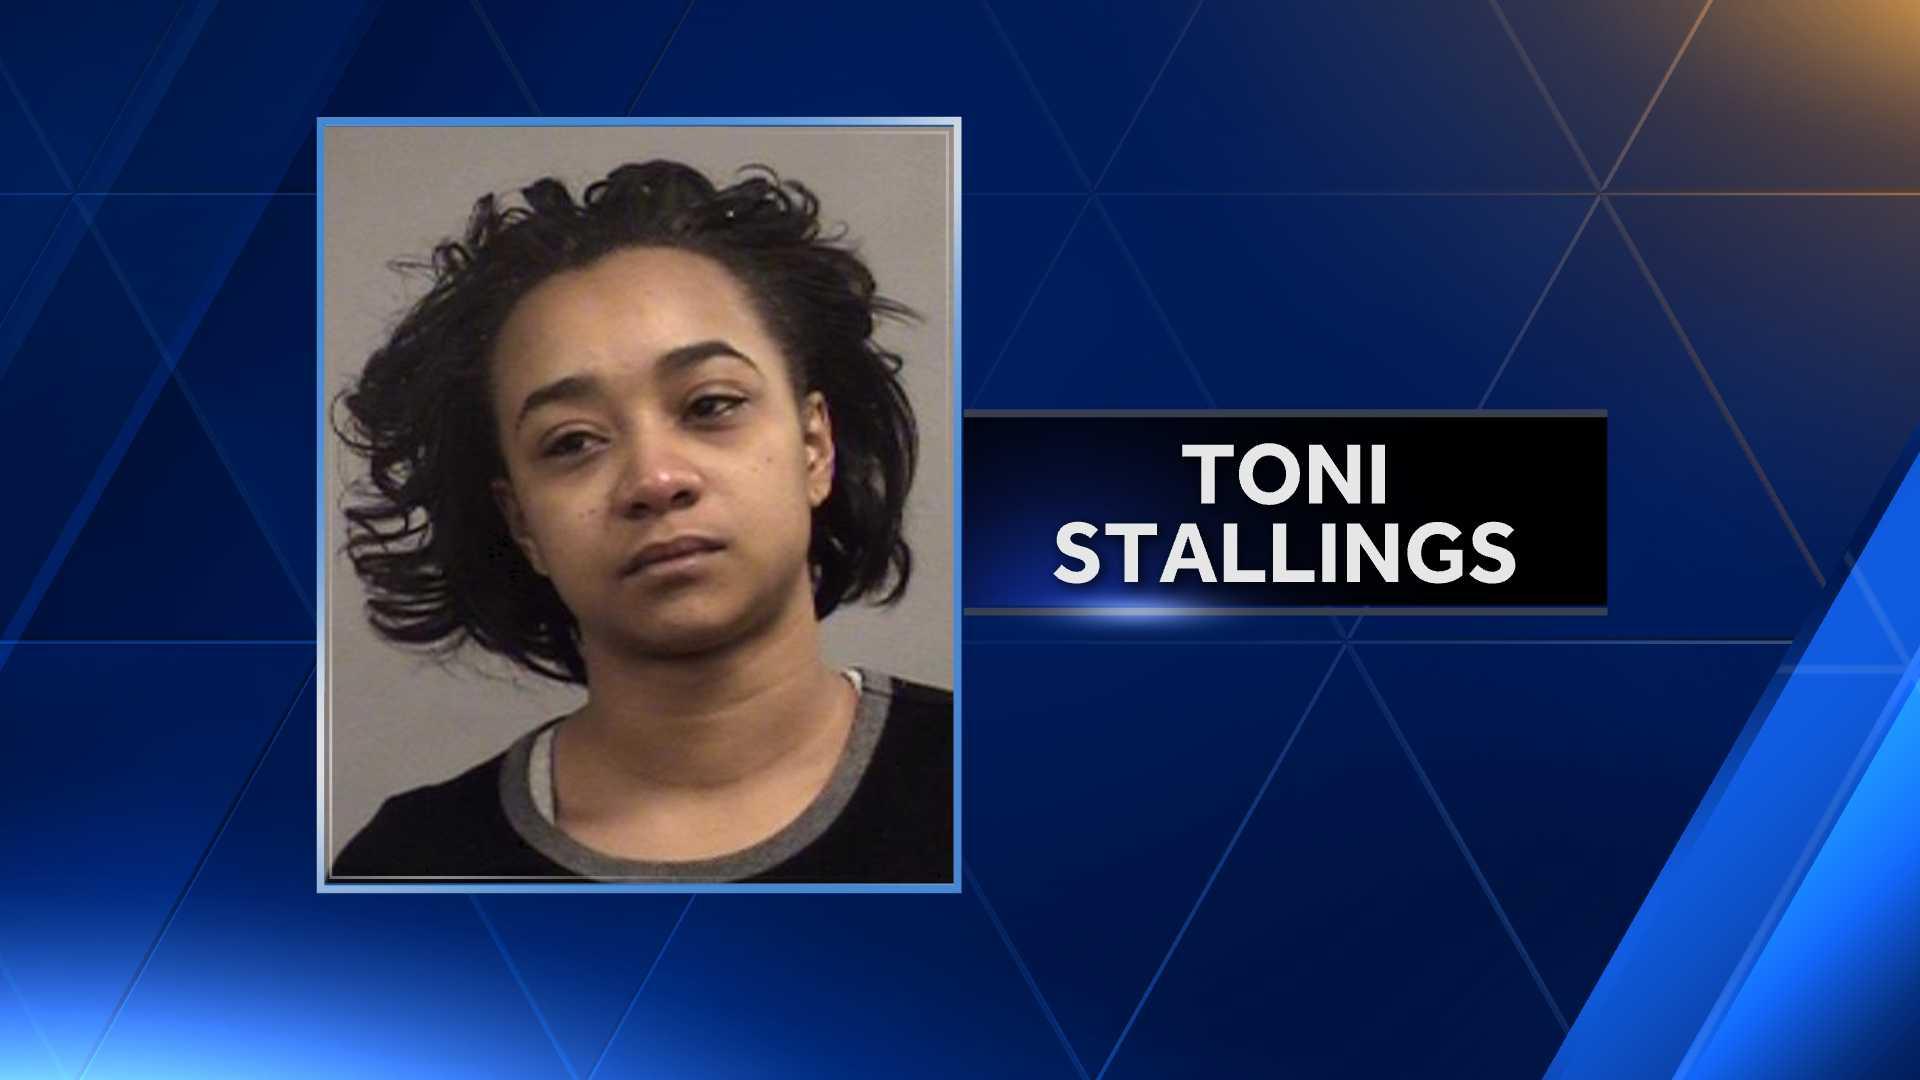 Toni Stallings